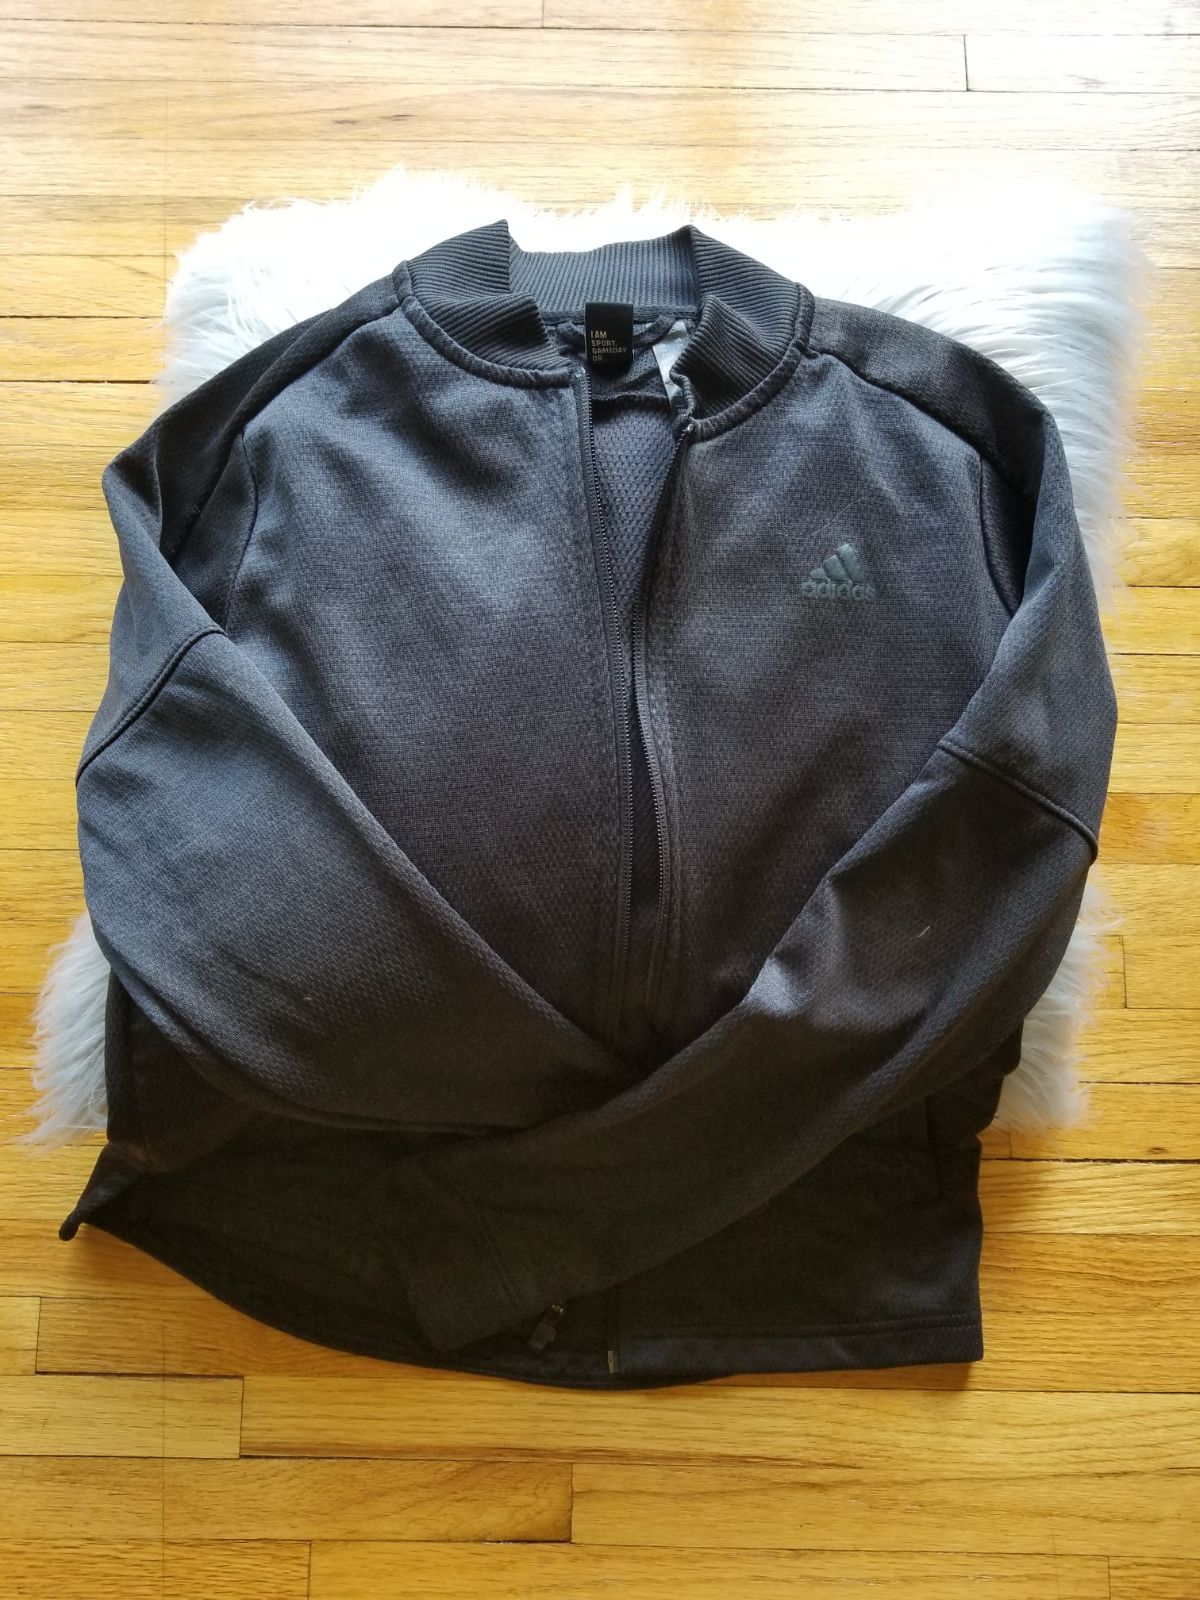 Adidas Climawarm Jacket